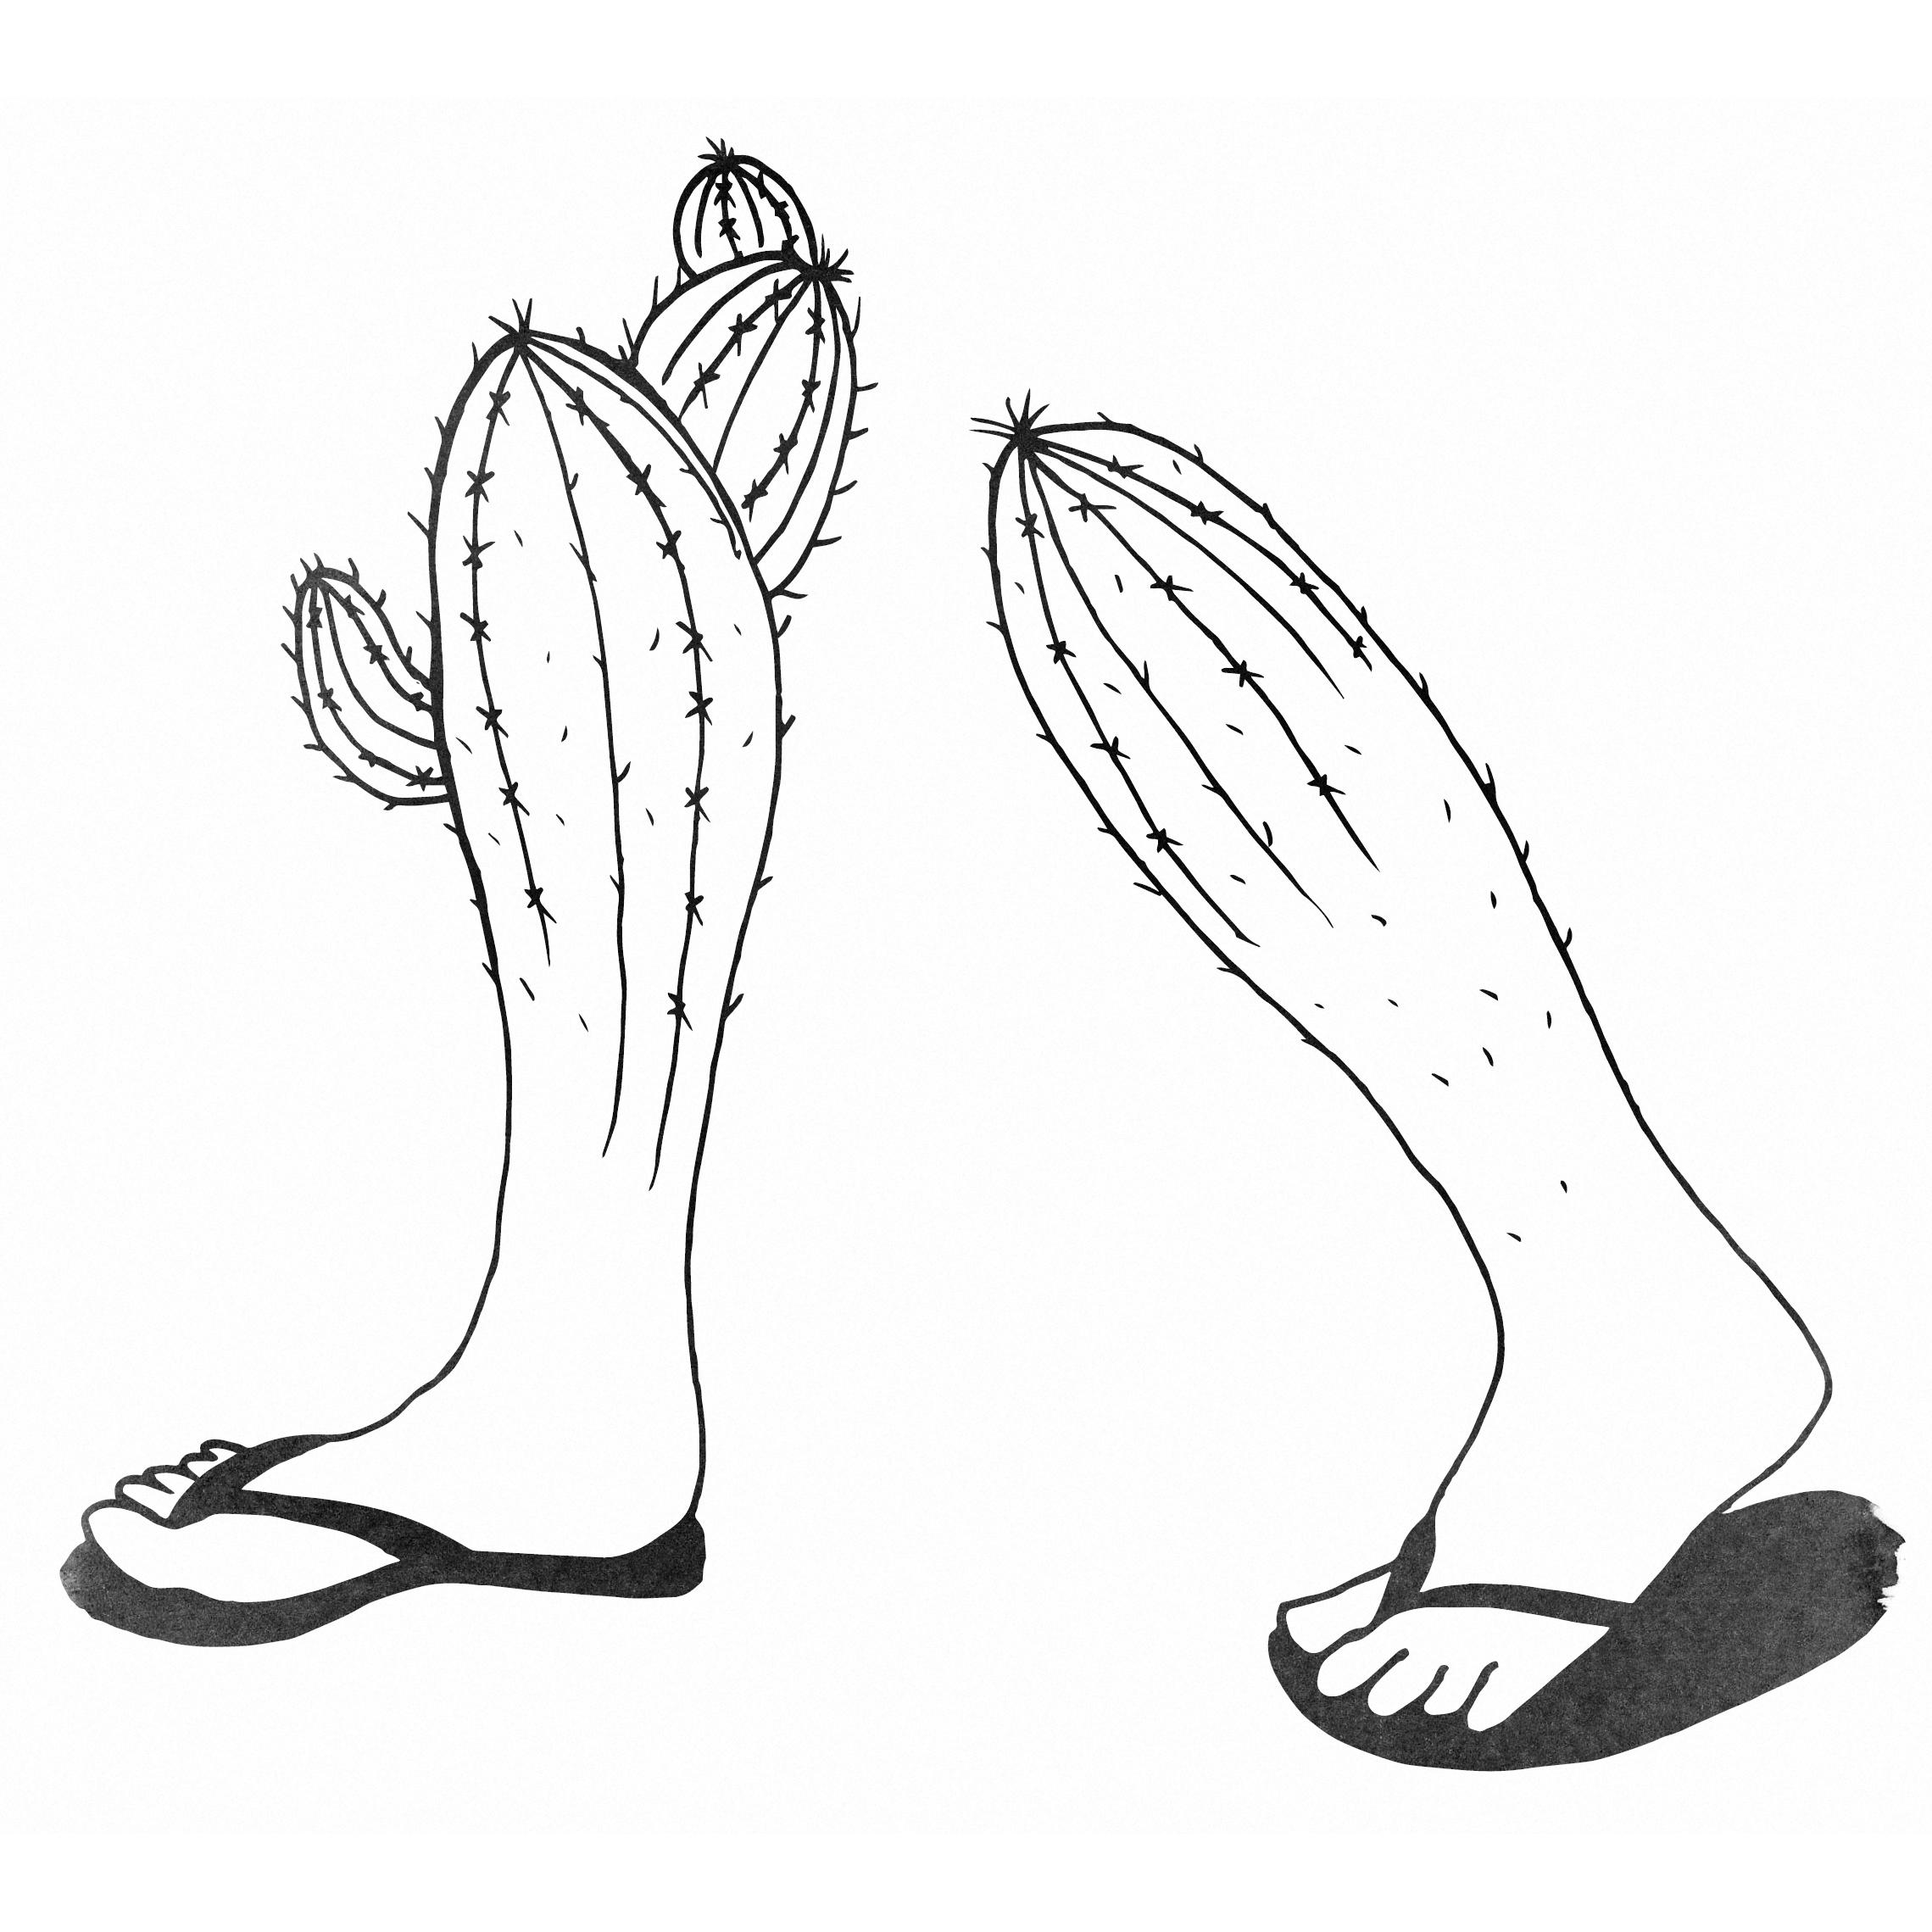 cactus-feet-2.jpg